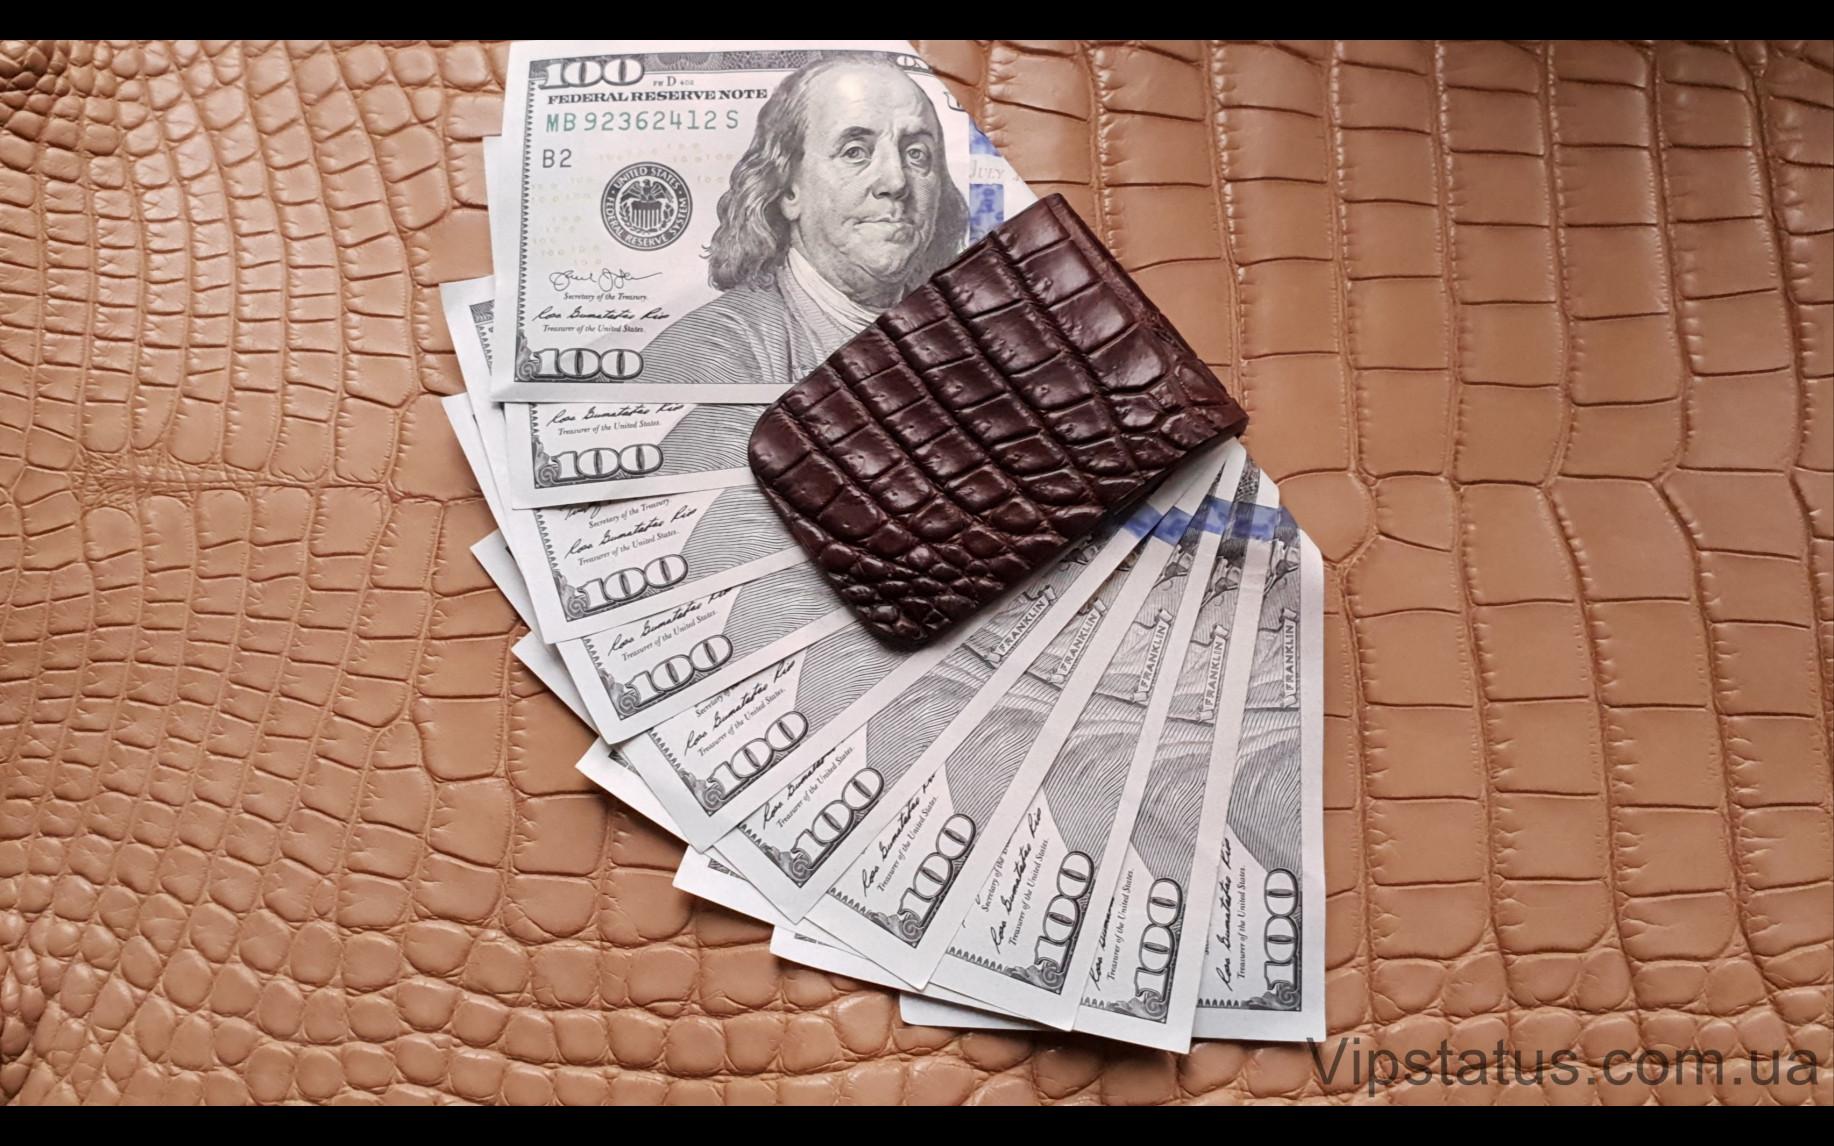 Elite Сhocolate Лакшери зажим для купюр Сhocolate Luxury bill clip image 3